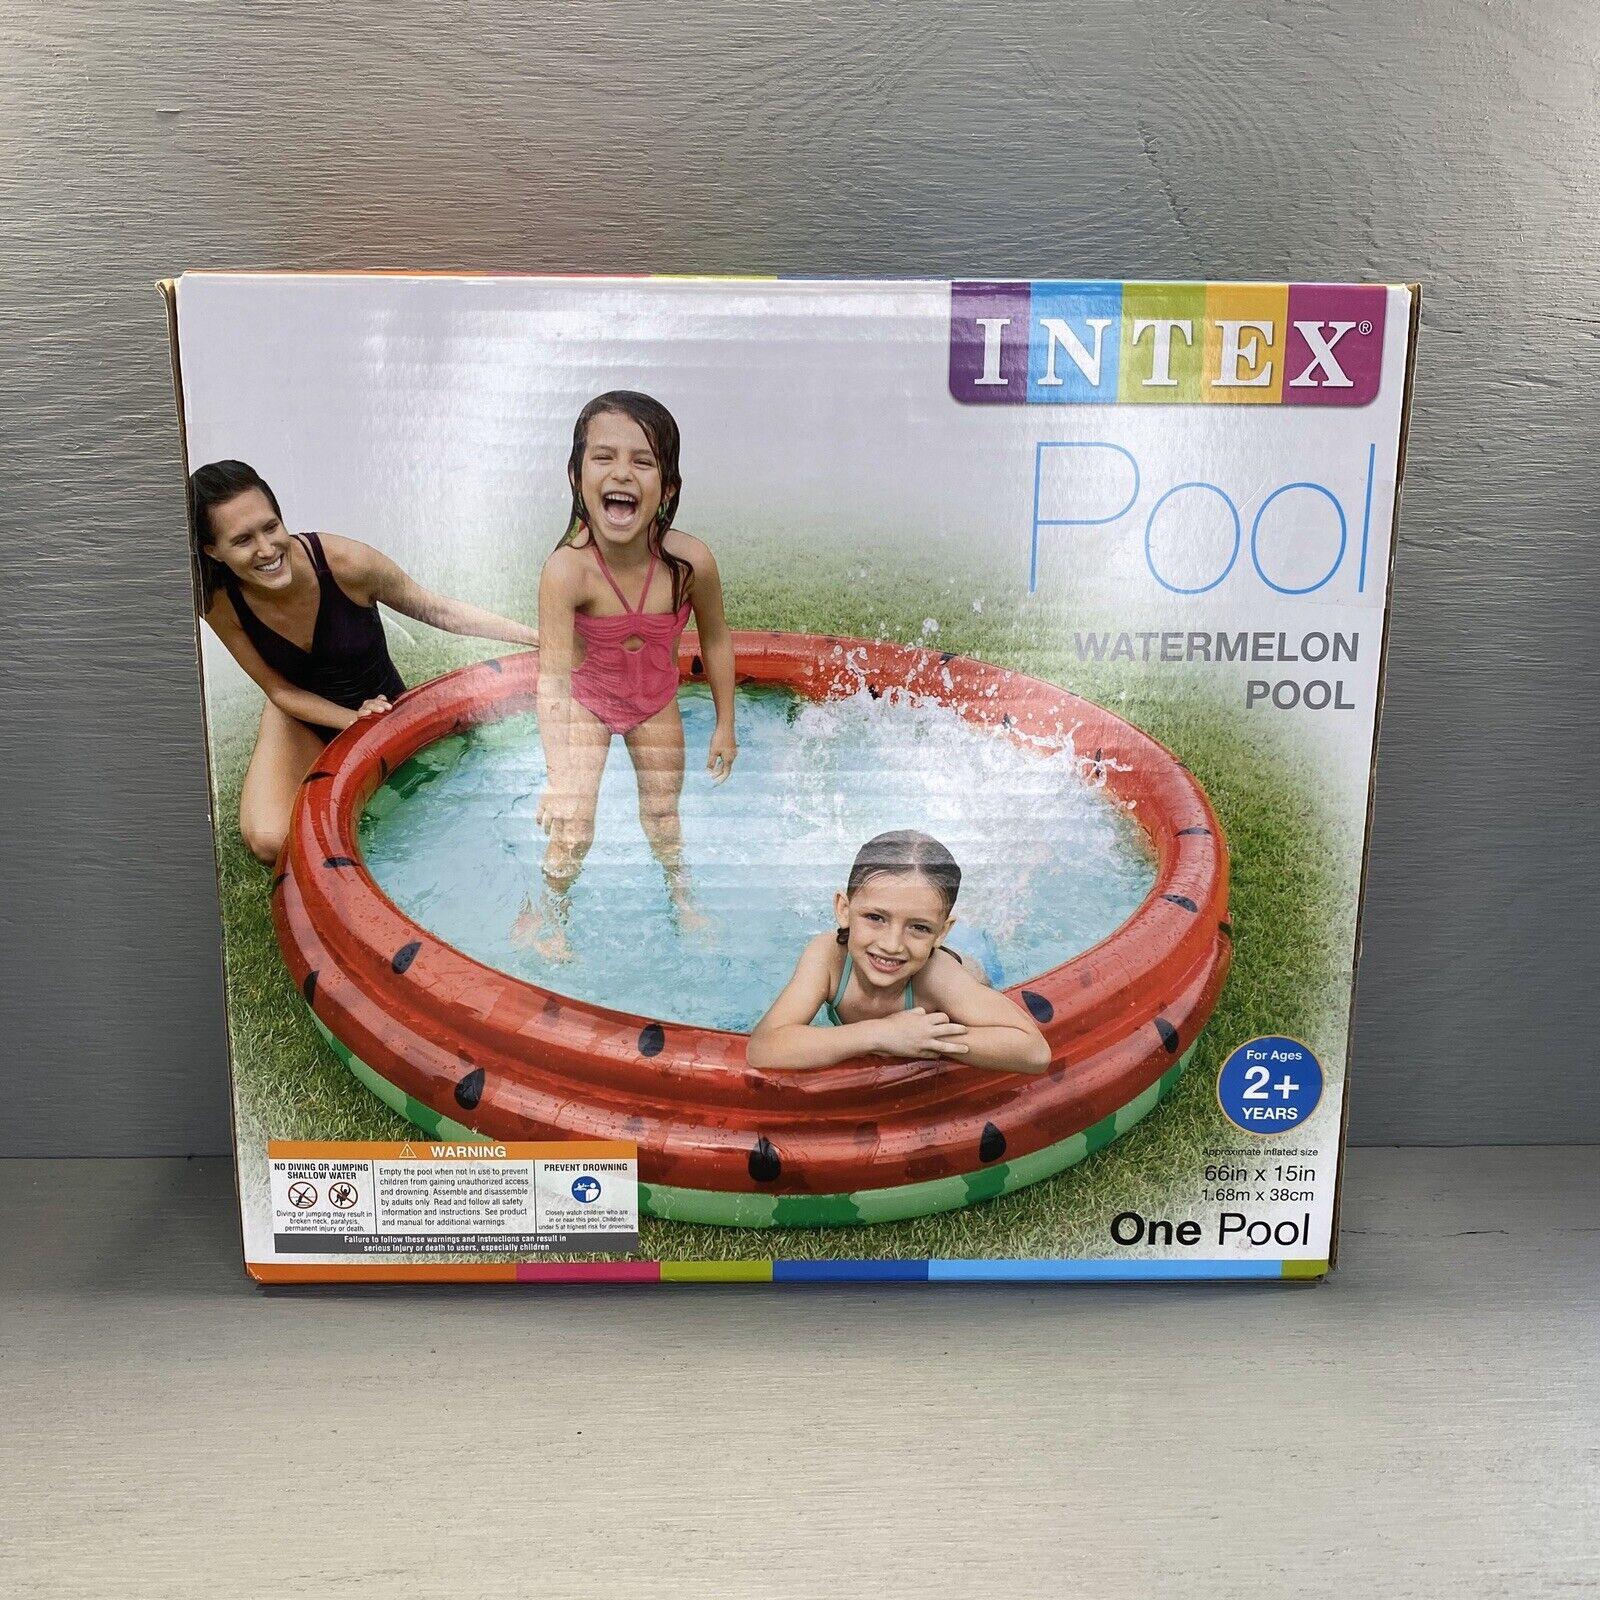 INTEX 66in x 15in Watermelon Inflatable Kid Pool